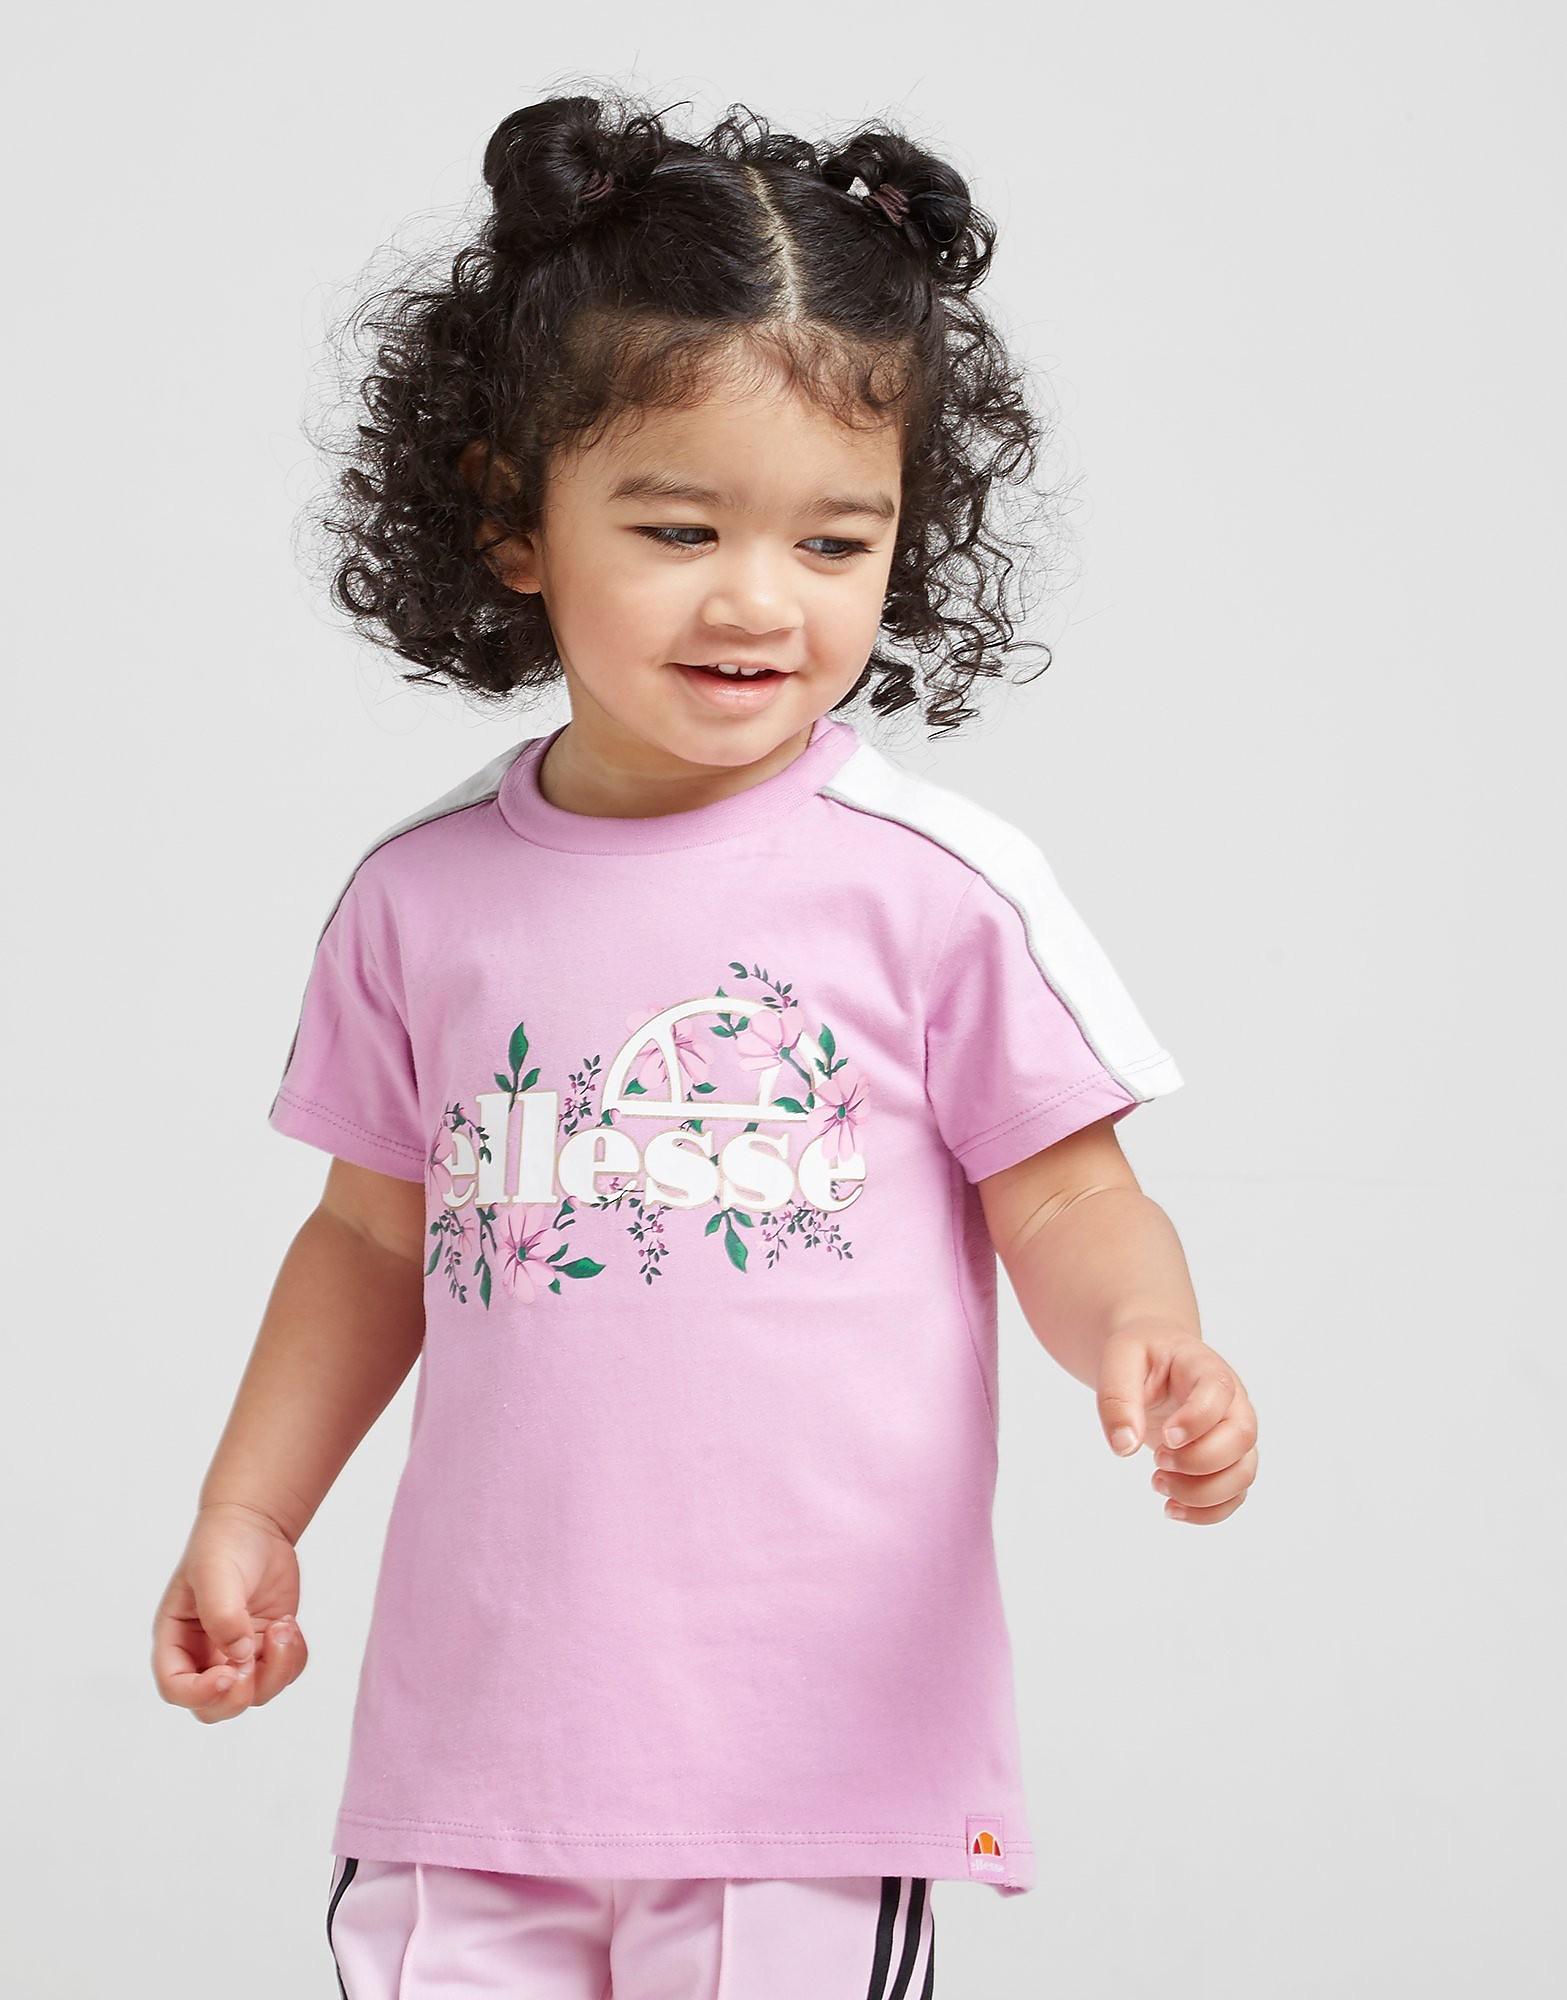 Ellesse Girls' Aster T-Shirt Baby's - alleen bij JD - Lilac/White - Kind